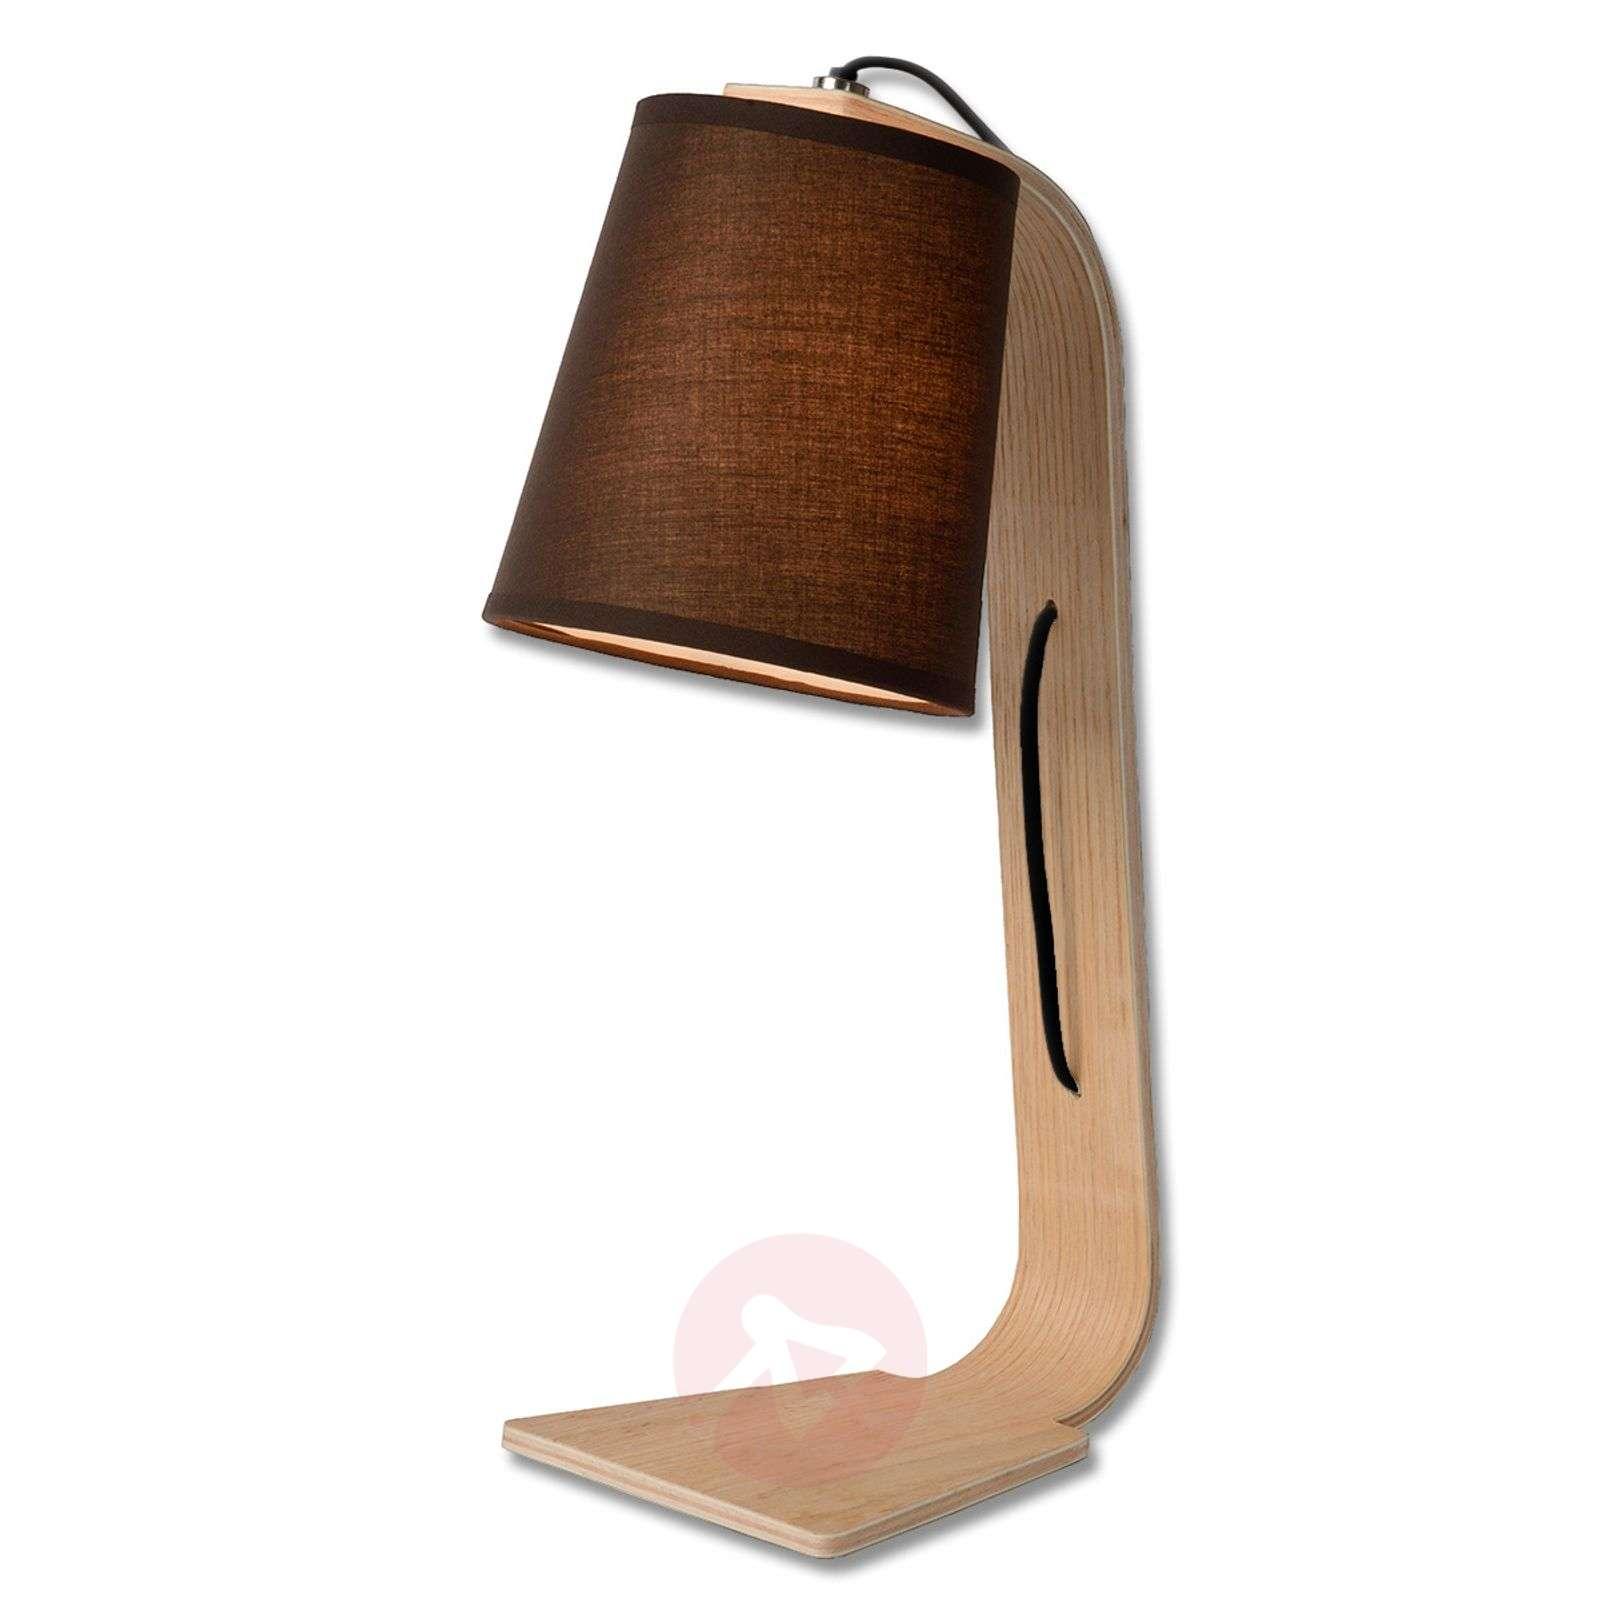 Black fabric shade Nordic wood table lamp-6054873-01